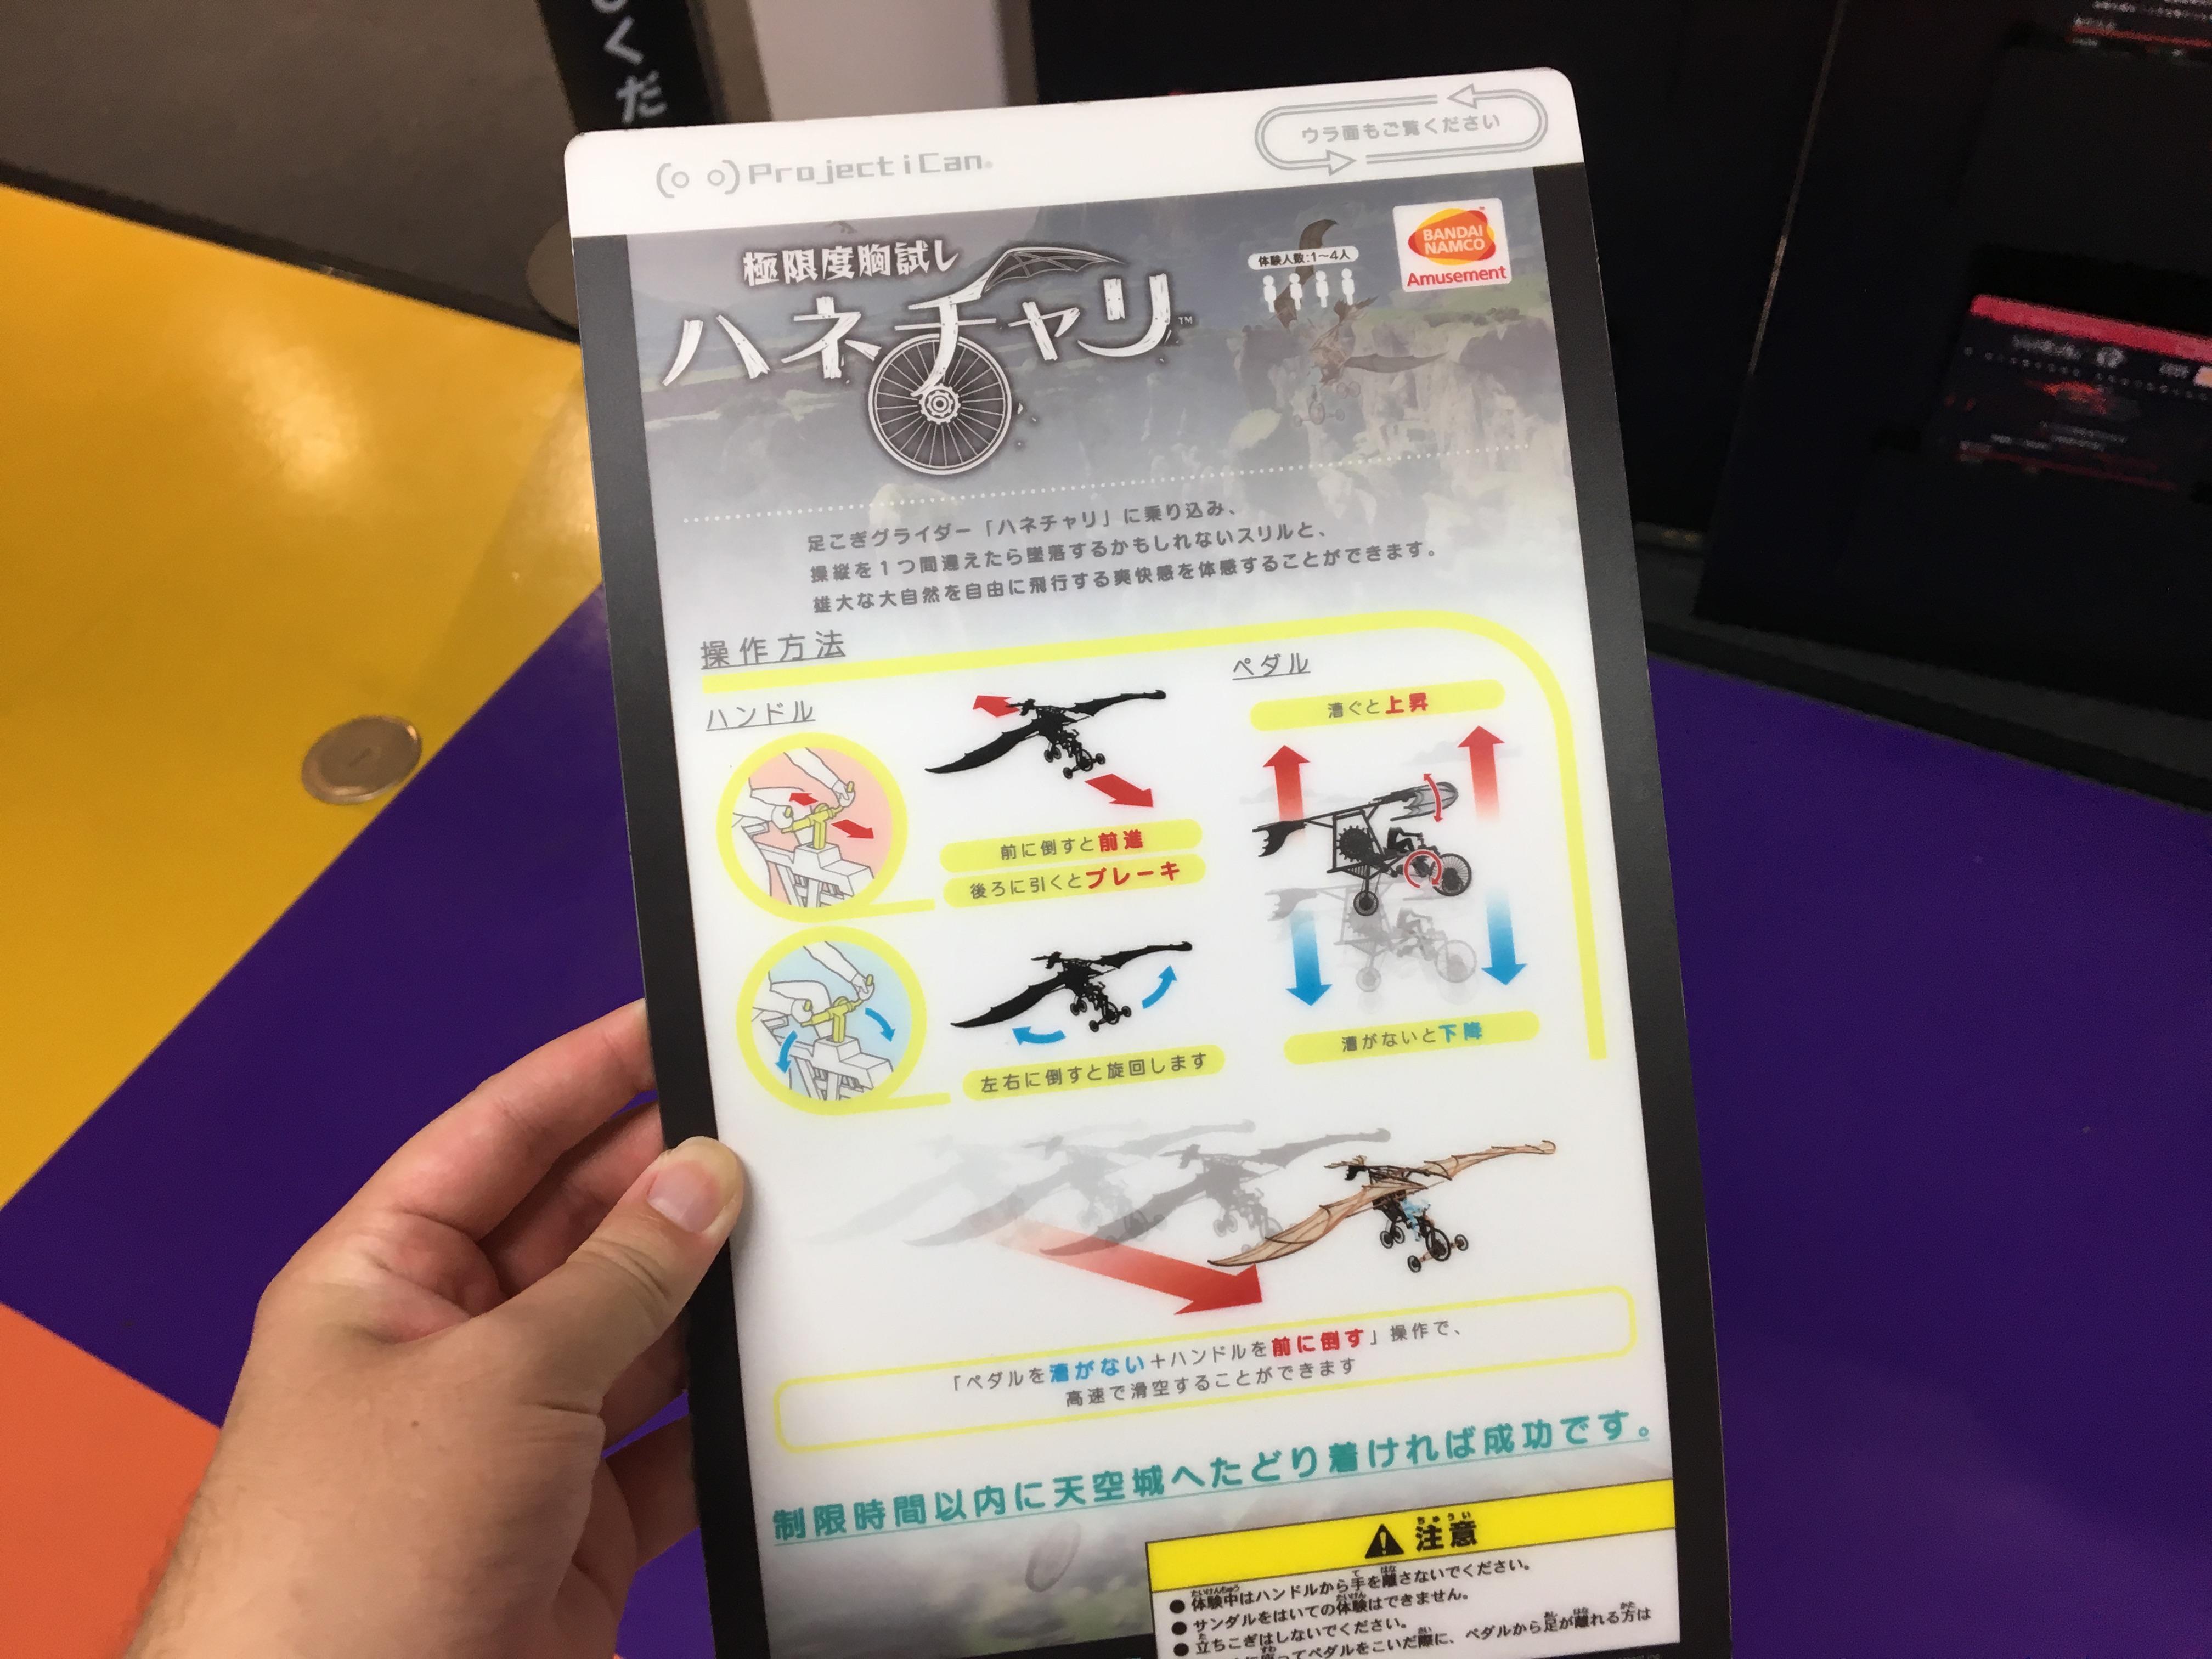 『VR ZONE Portal』namco札幌エスタ店で体験できるハネチャリの説明